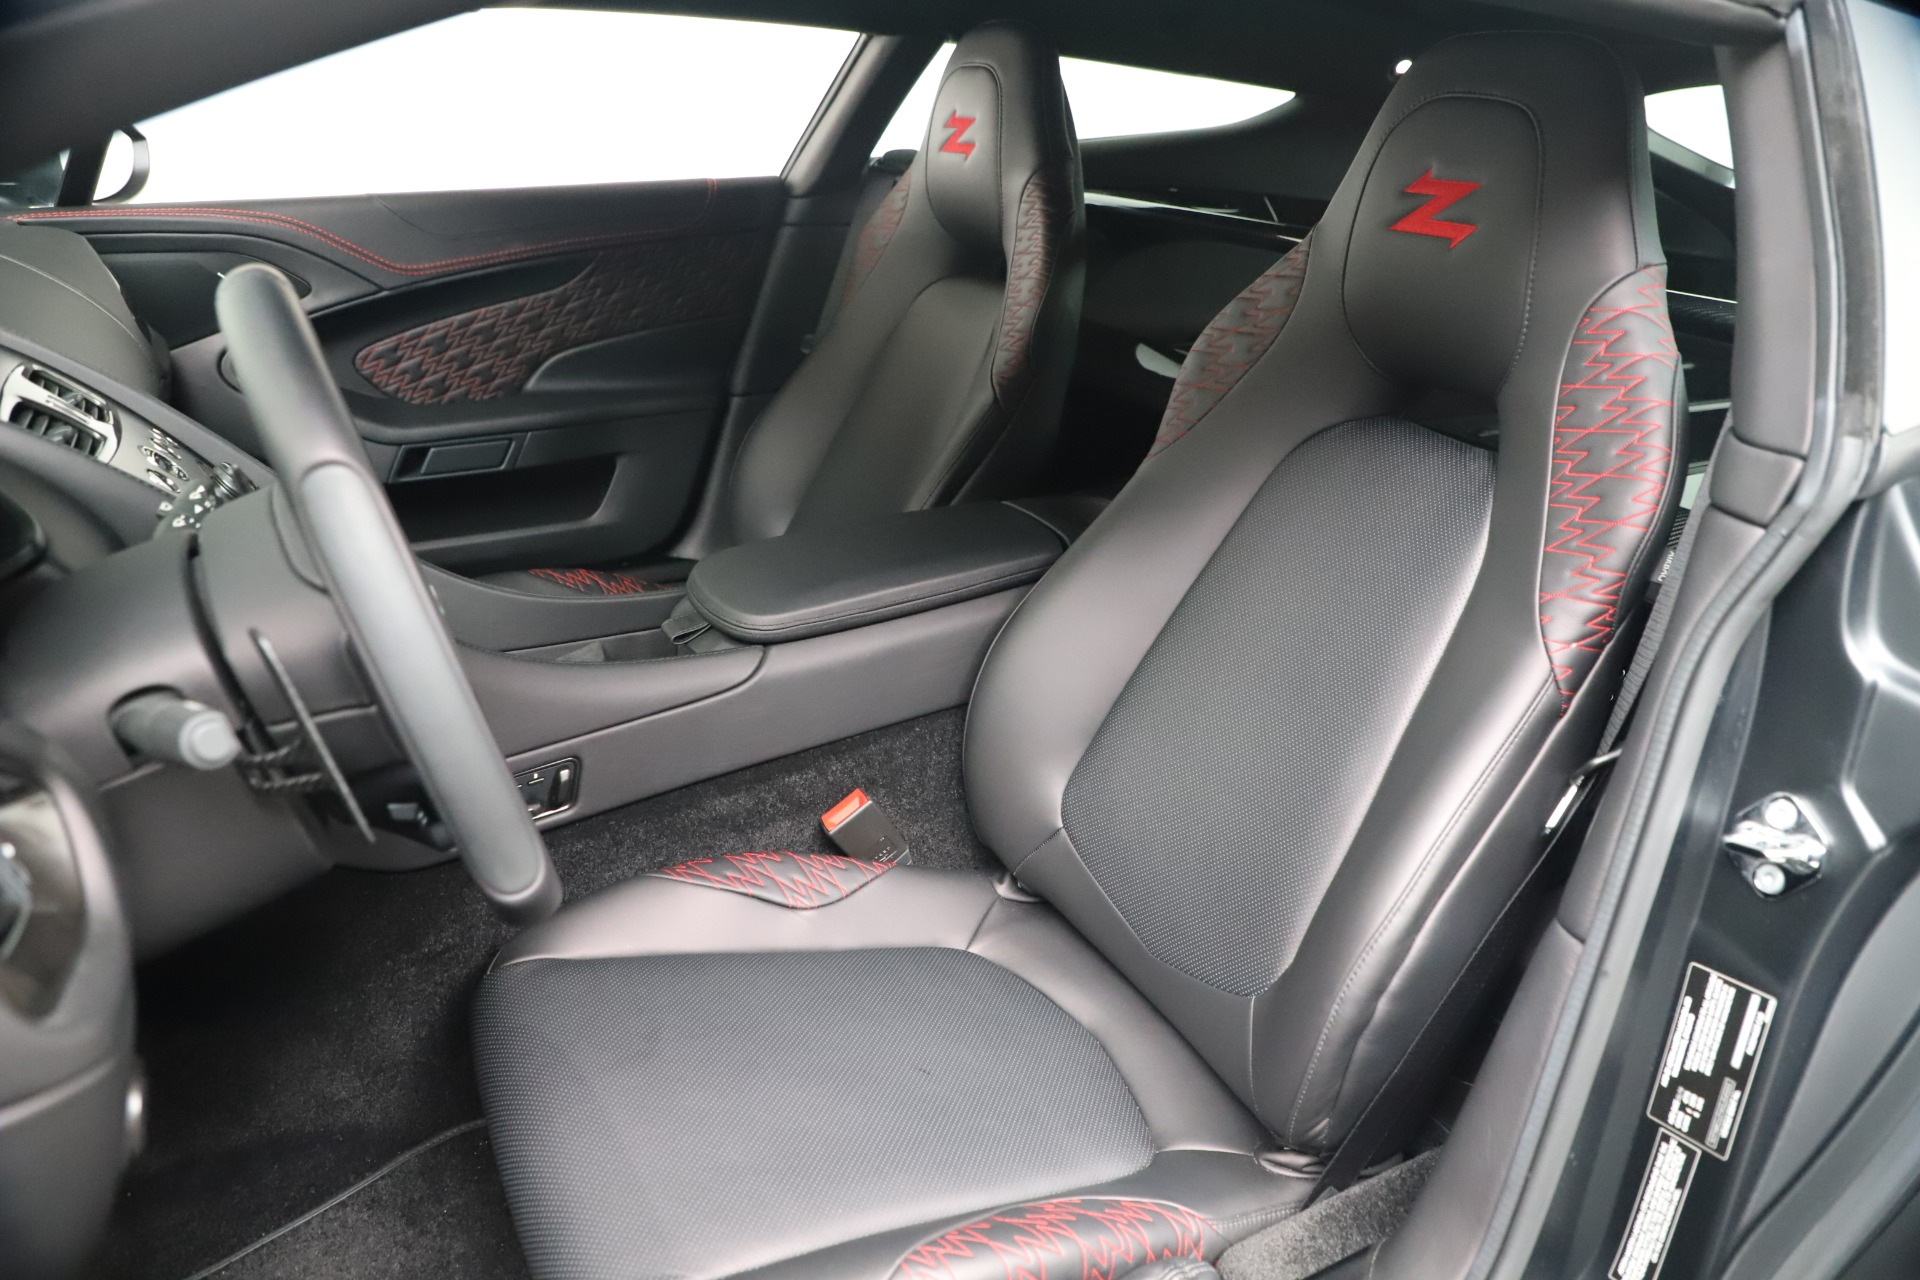 New 2019 Aston Martin Vanquish Shooting Brake For Sale In Westport, CT 3512_p15